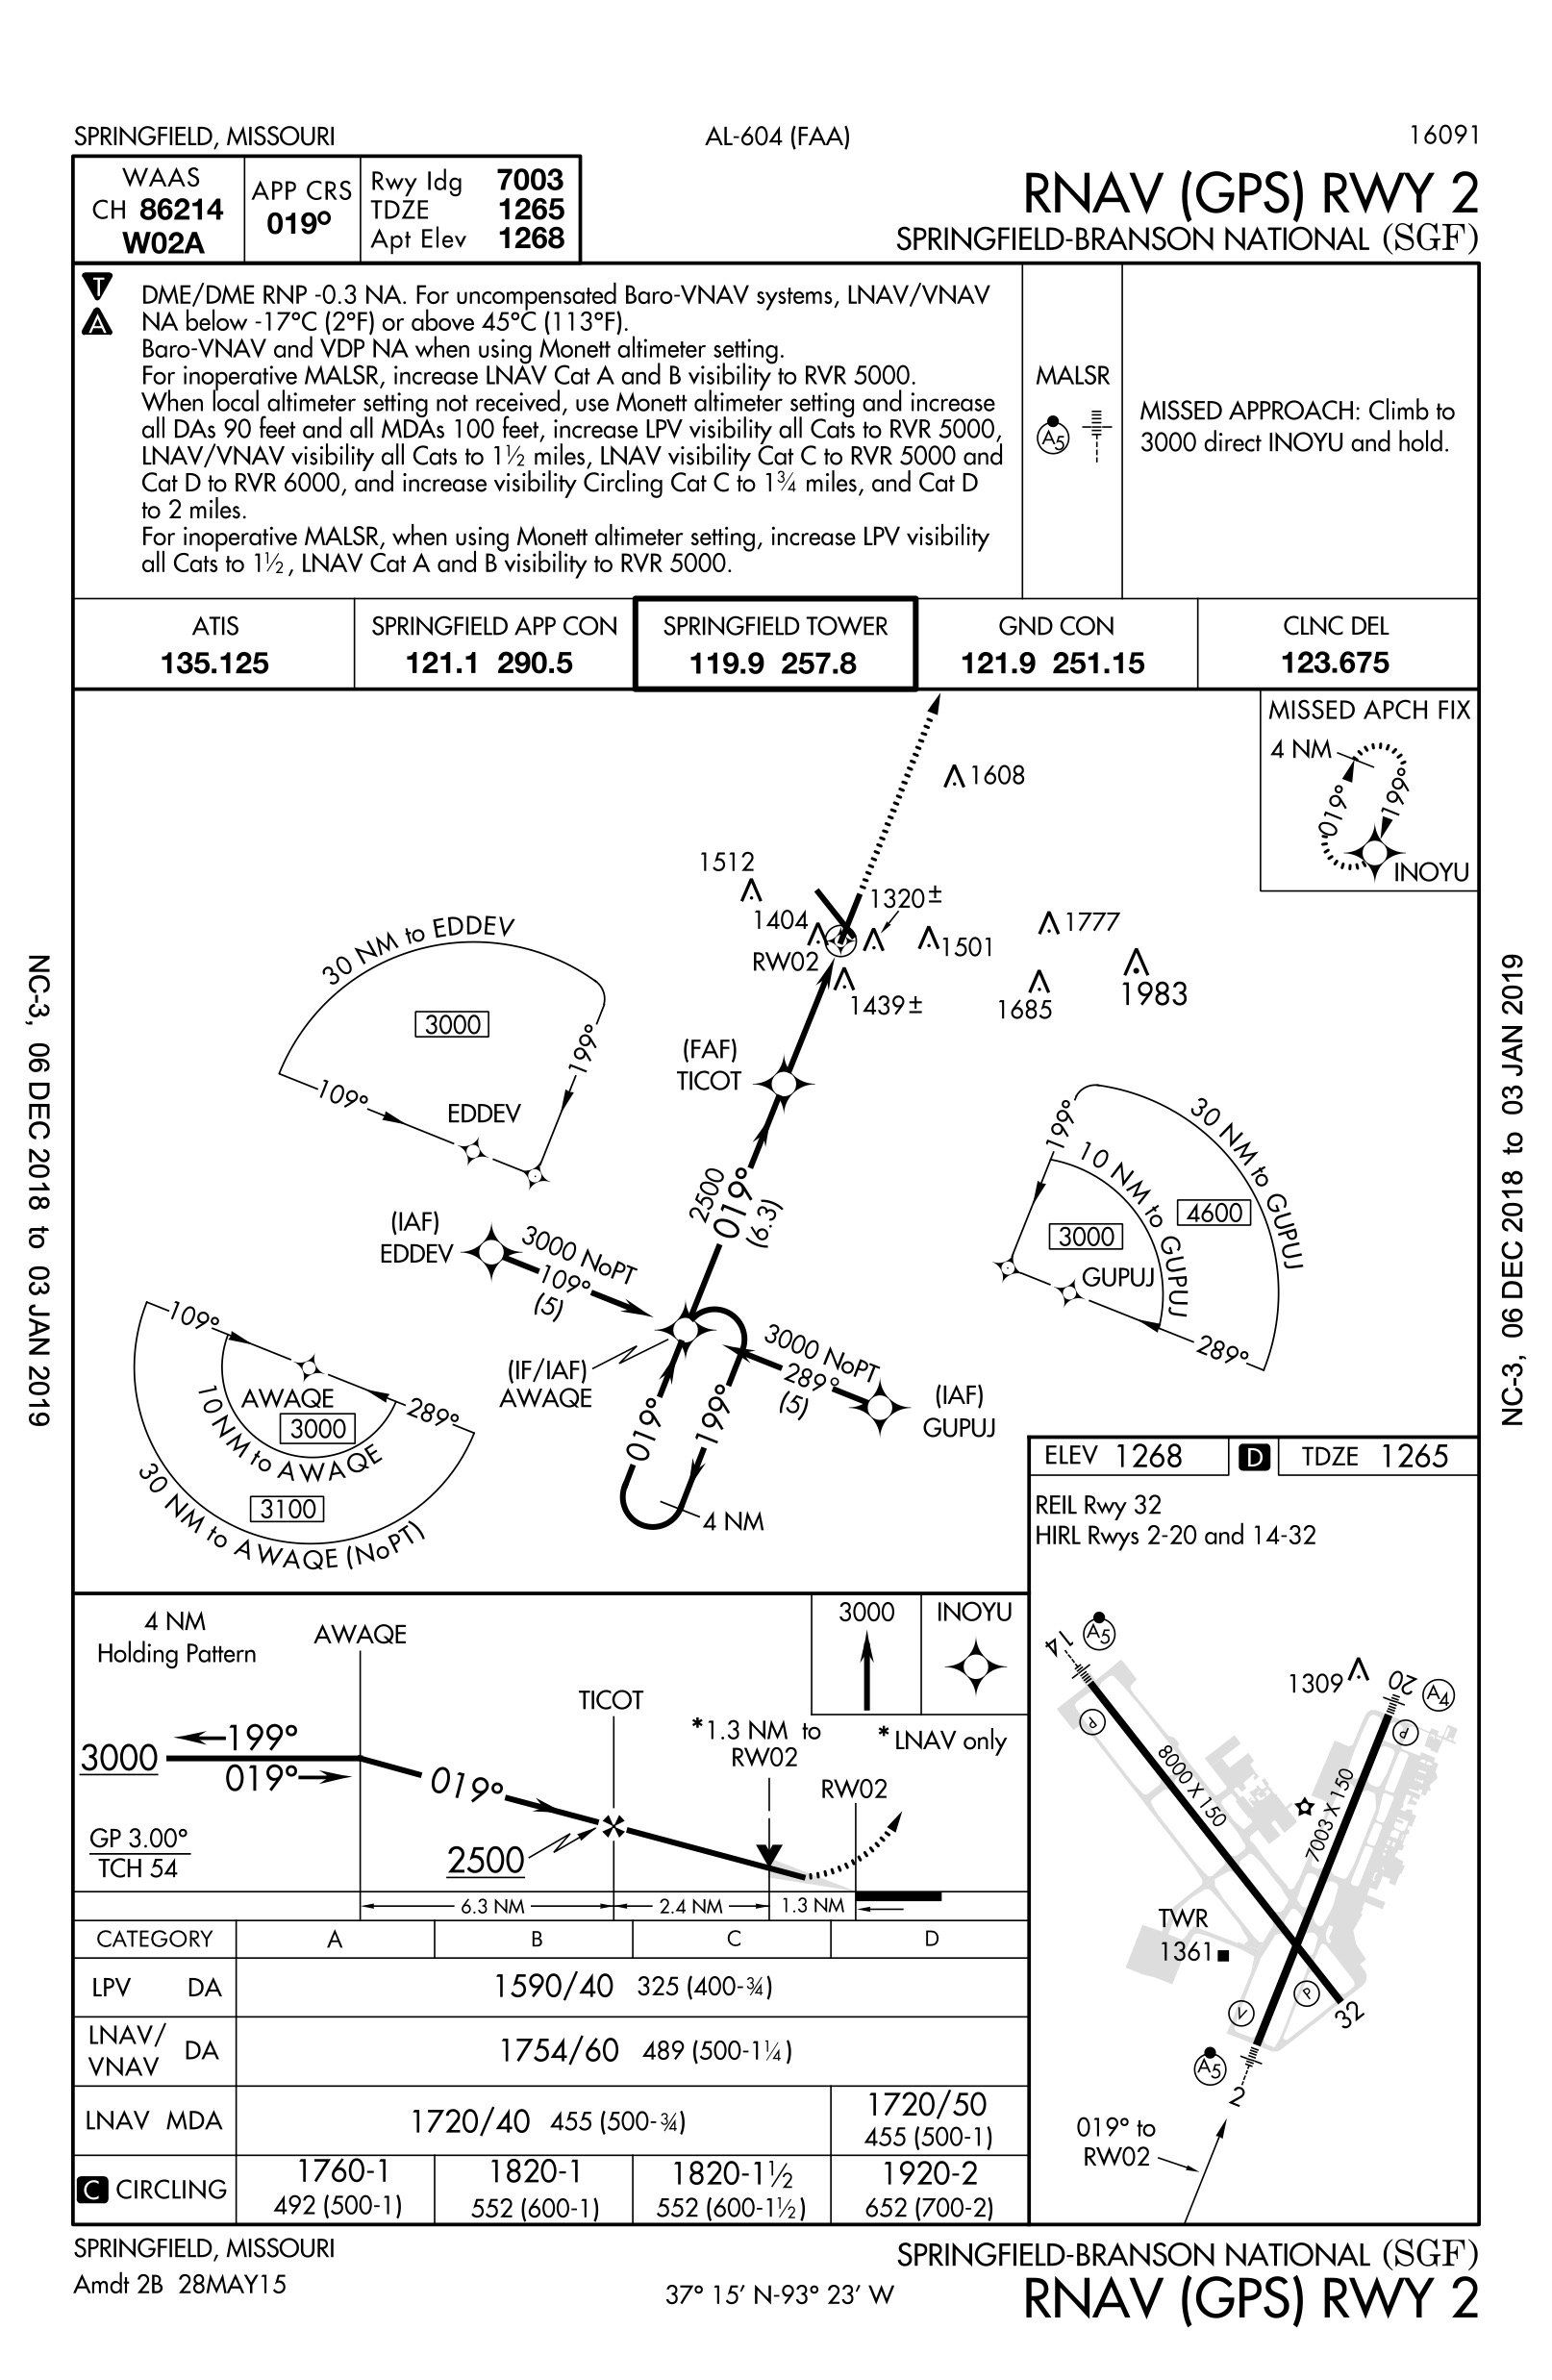 KSGF_GPS2processed